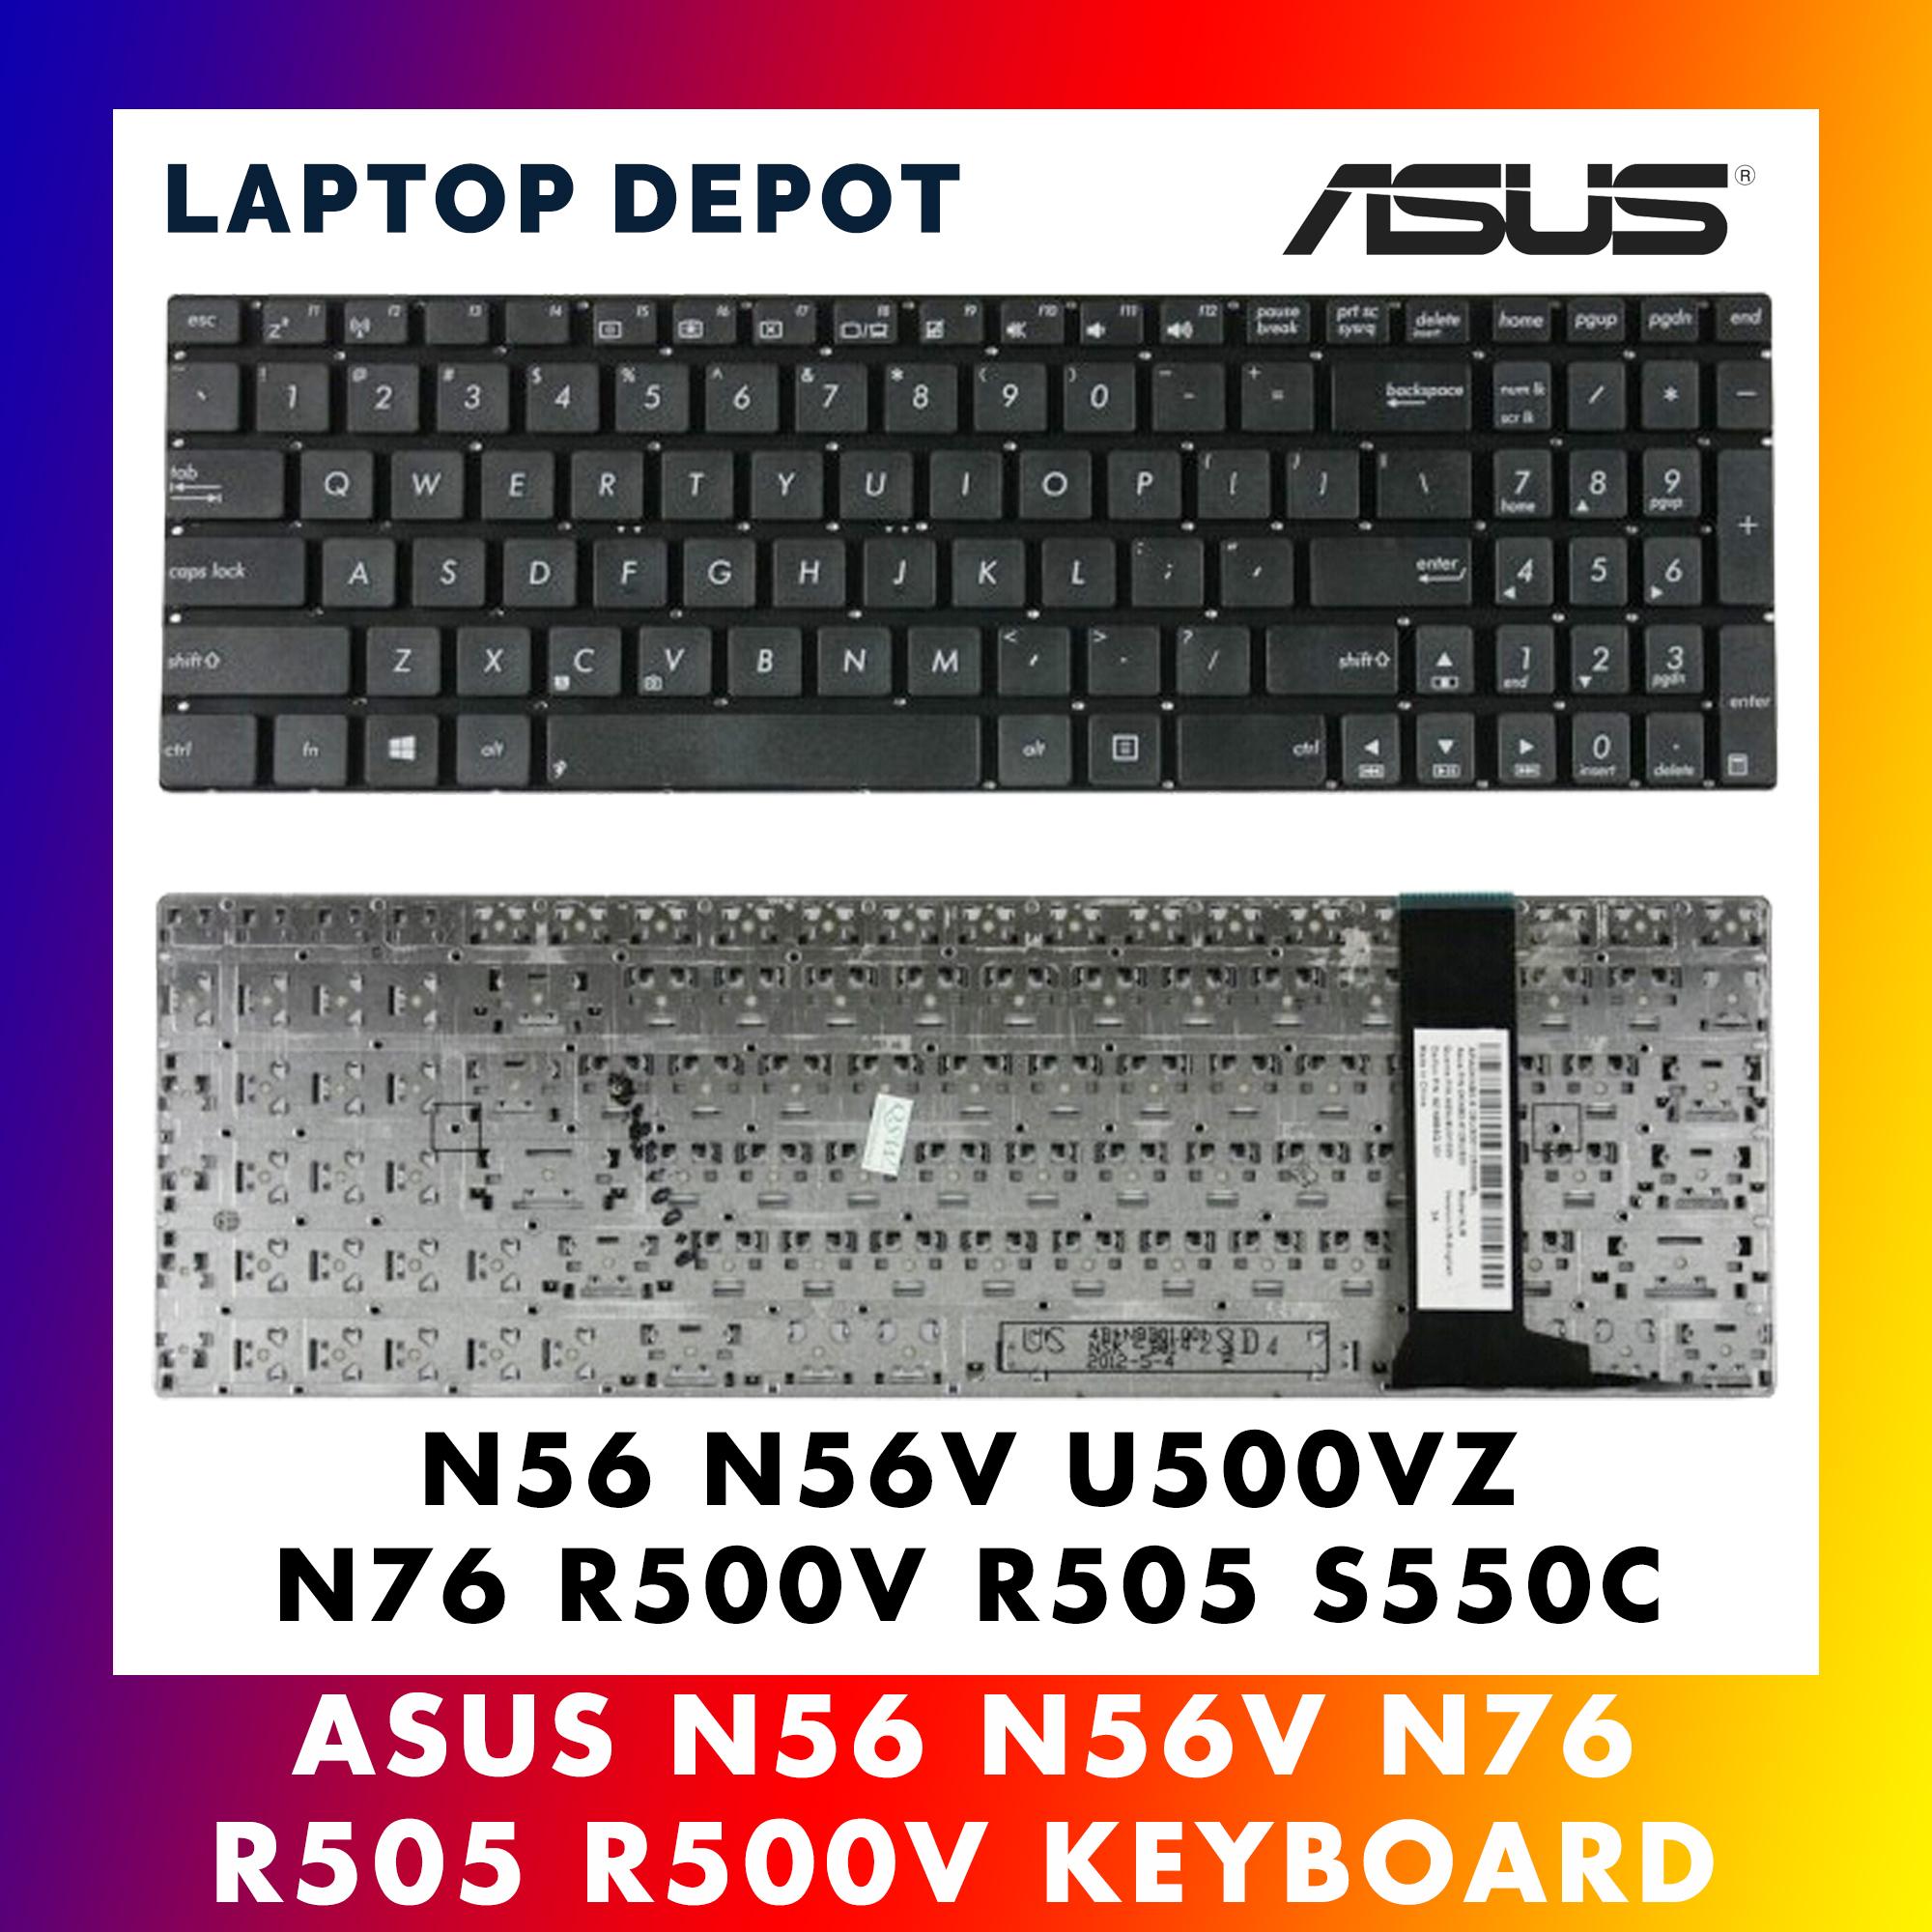 Beste Asus N56 N56V U500VZ N76 R500V R505 (end 9/28/2021 12:00 AM) VQ-74